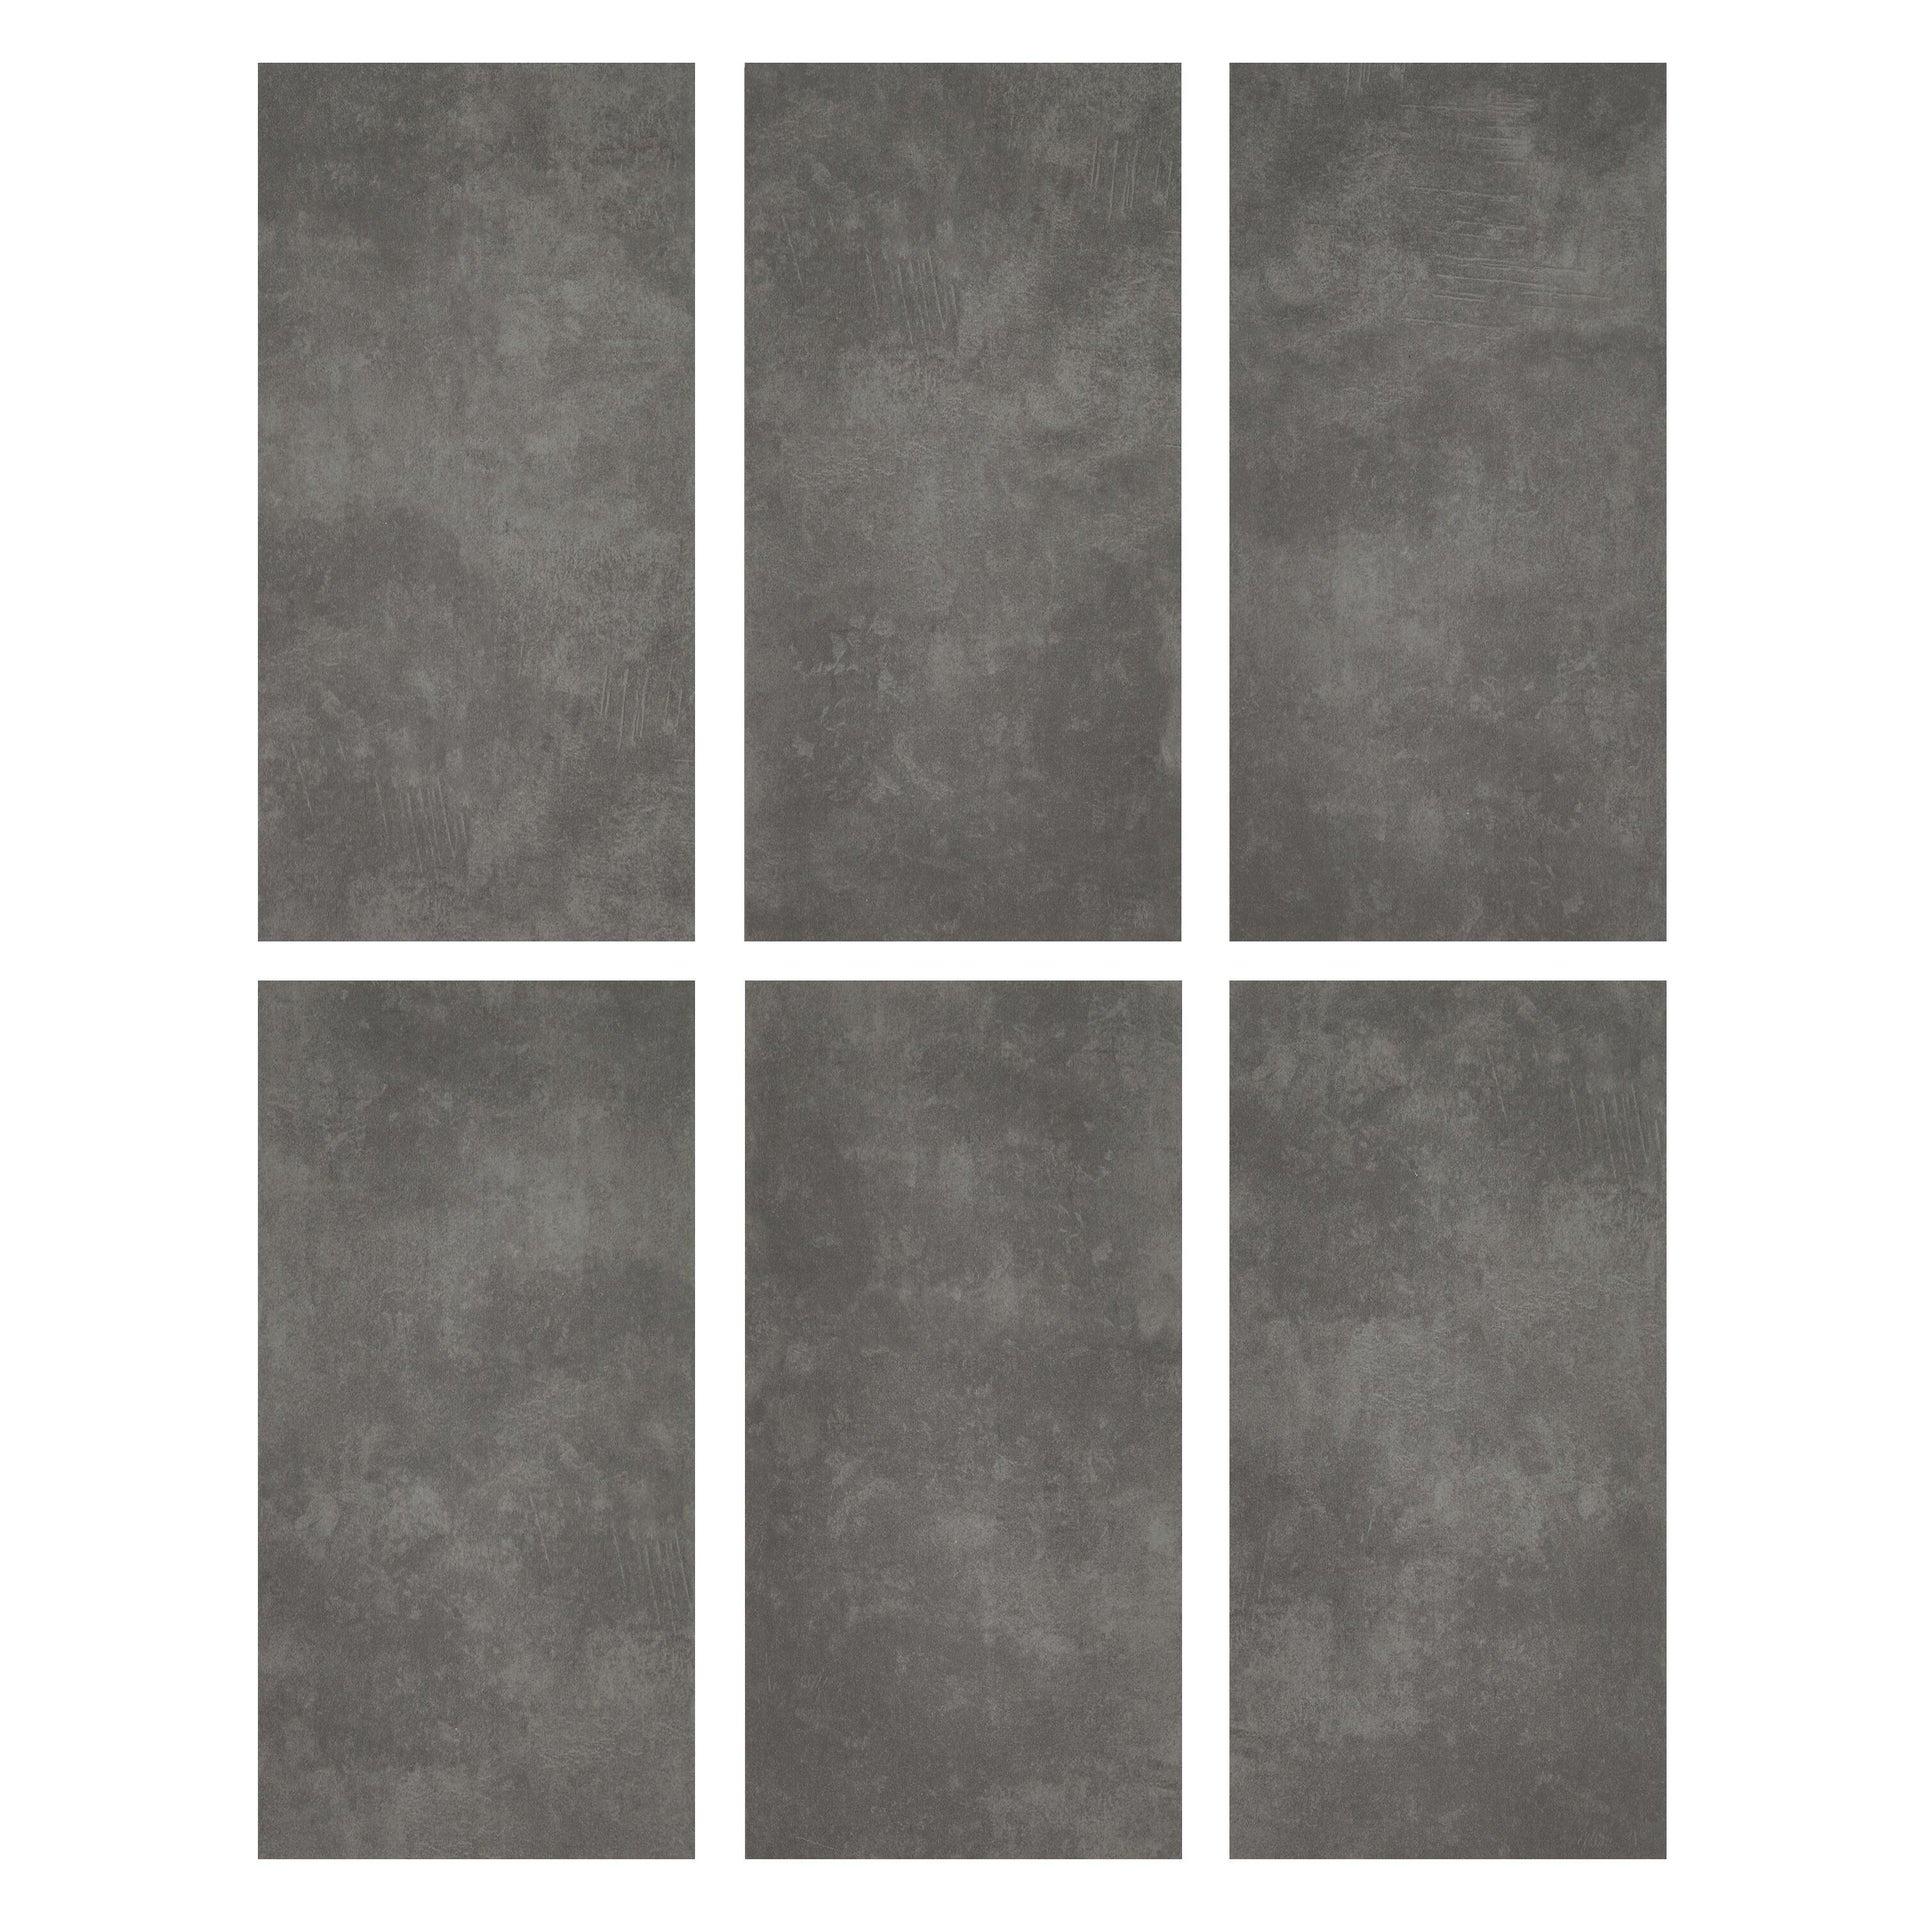 Pavimento PVC incastro Tolu Sp 4 mm grigio / argento - 16